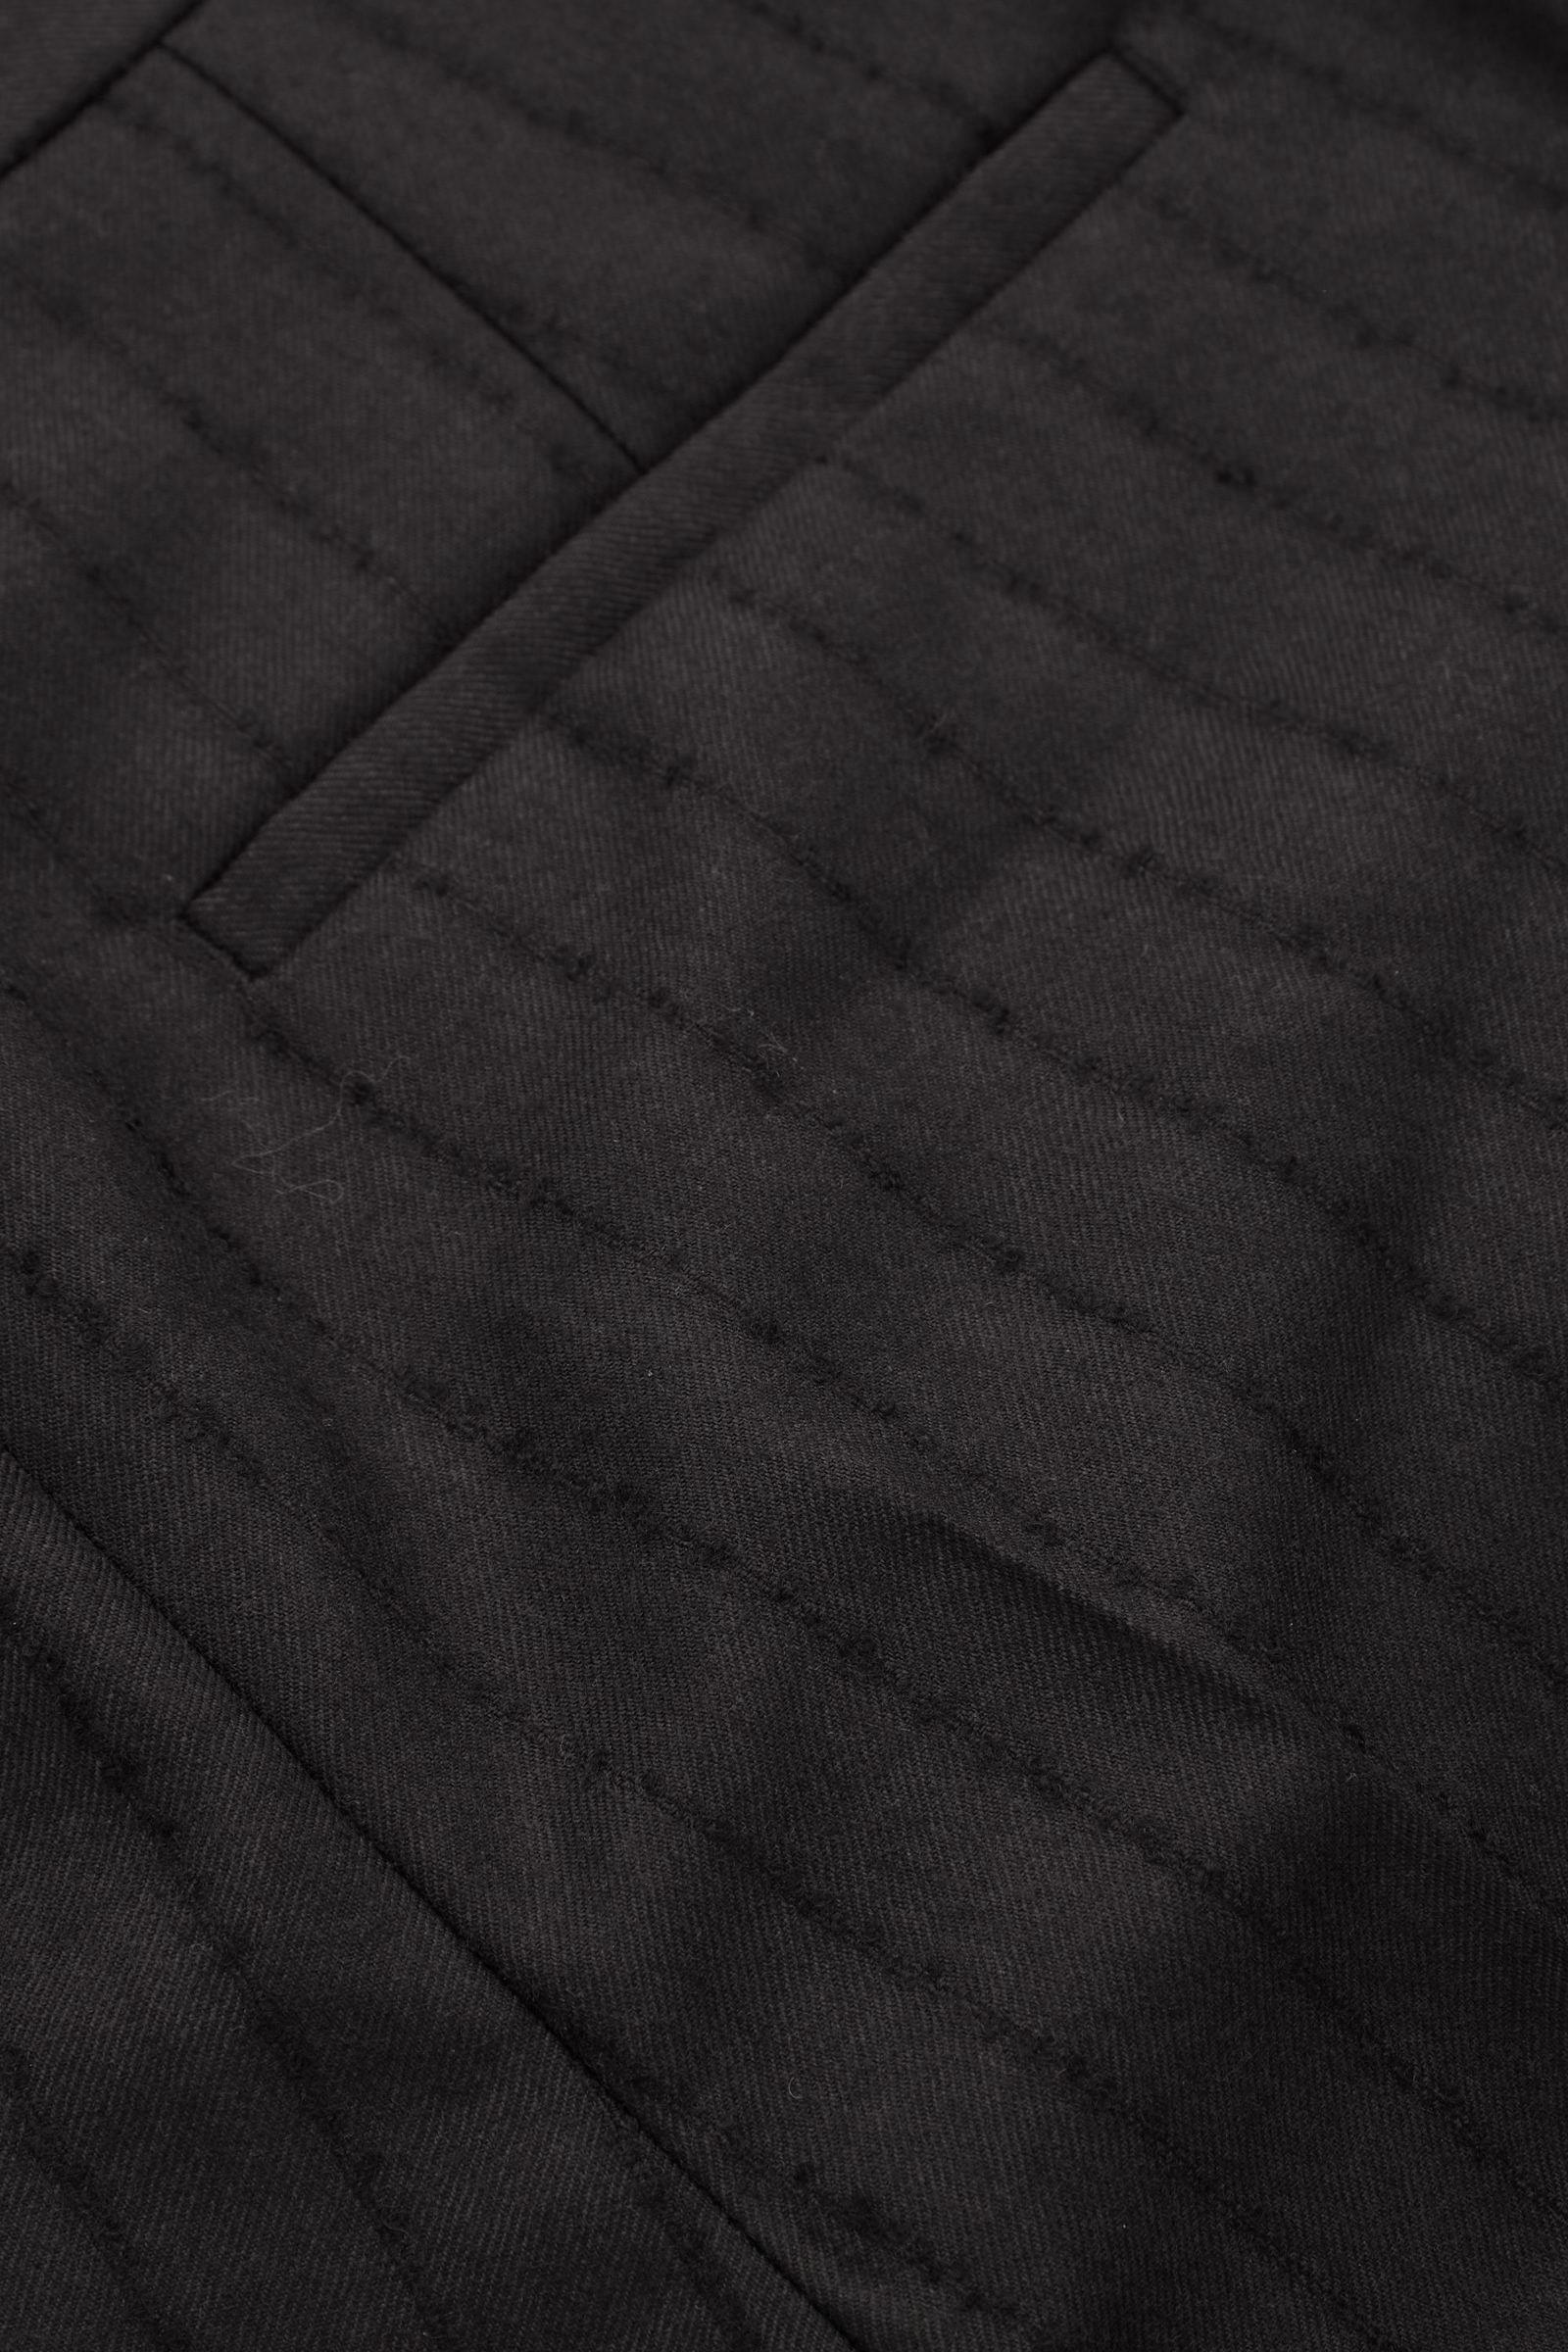 COS 슬림 울 핀스트라이프 트라우저의 블랙컬러 Detail입니다.